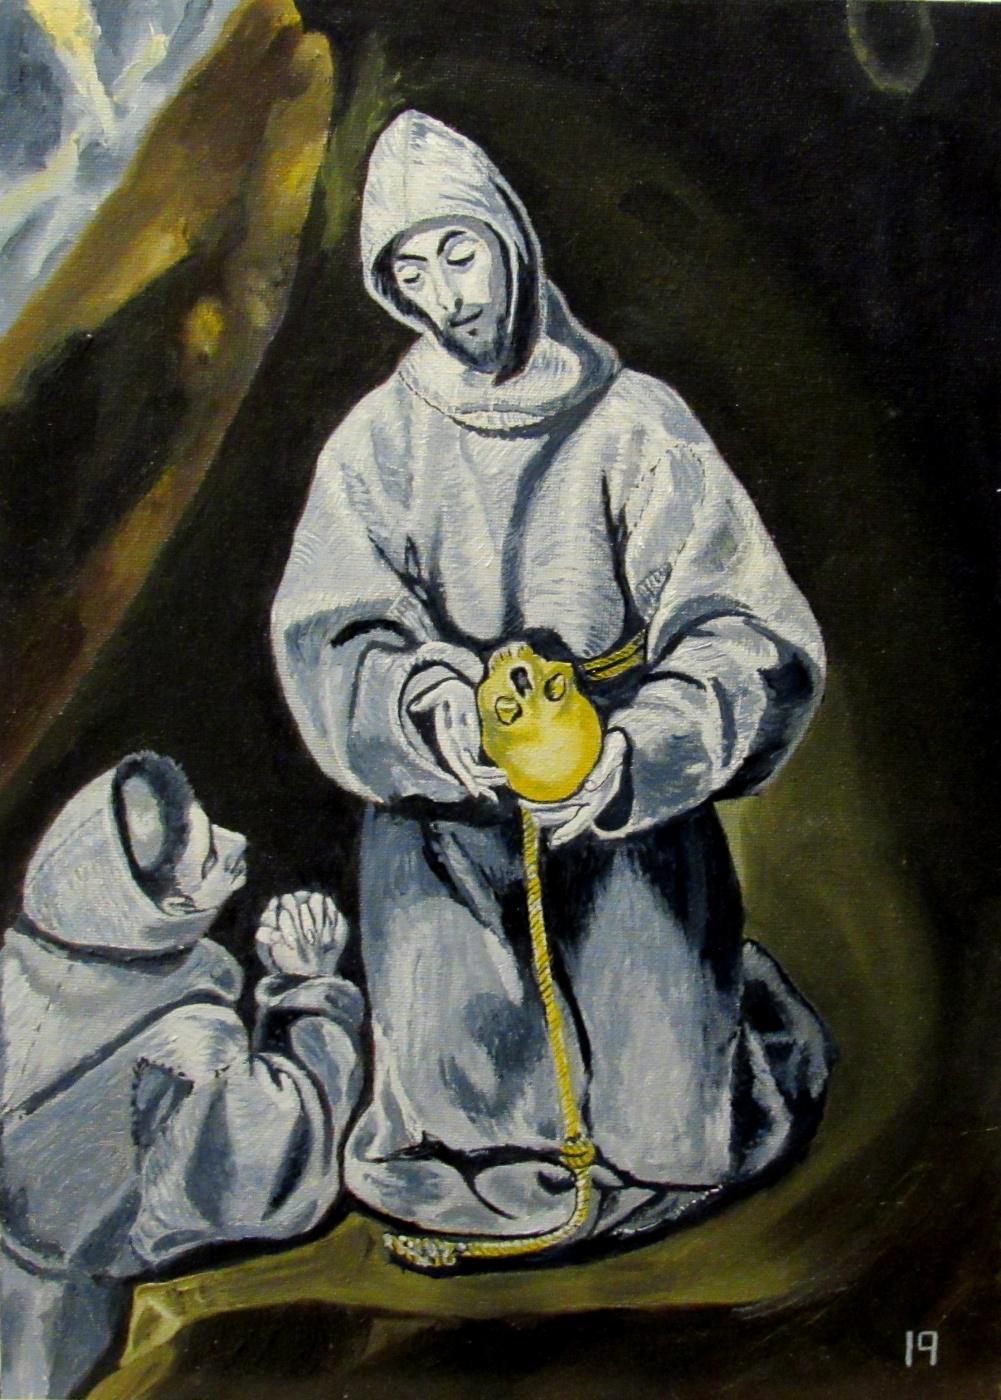 Artashes Vladimirovich Badalyan. El Greco (and workshop). St. Francis and brother Leo reflect on death - x-hardboard - 35x25